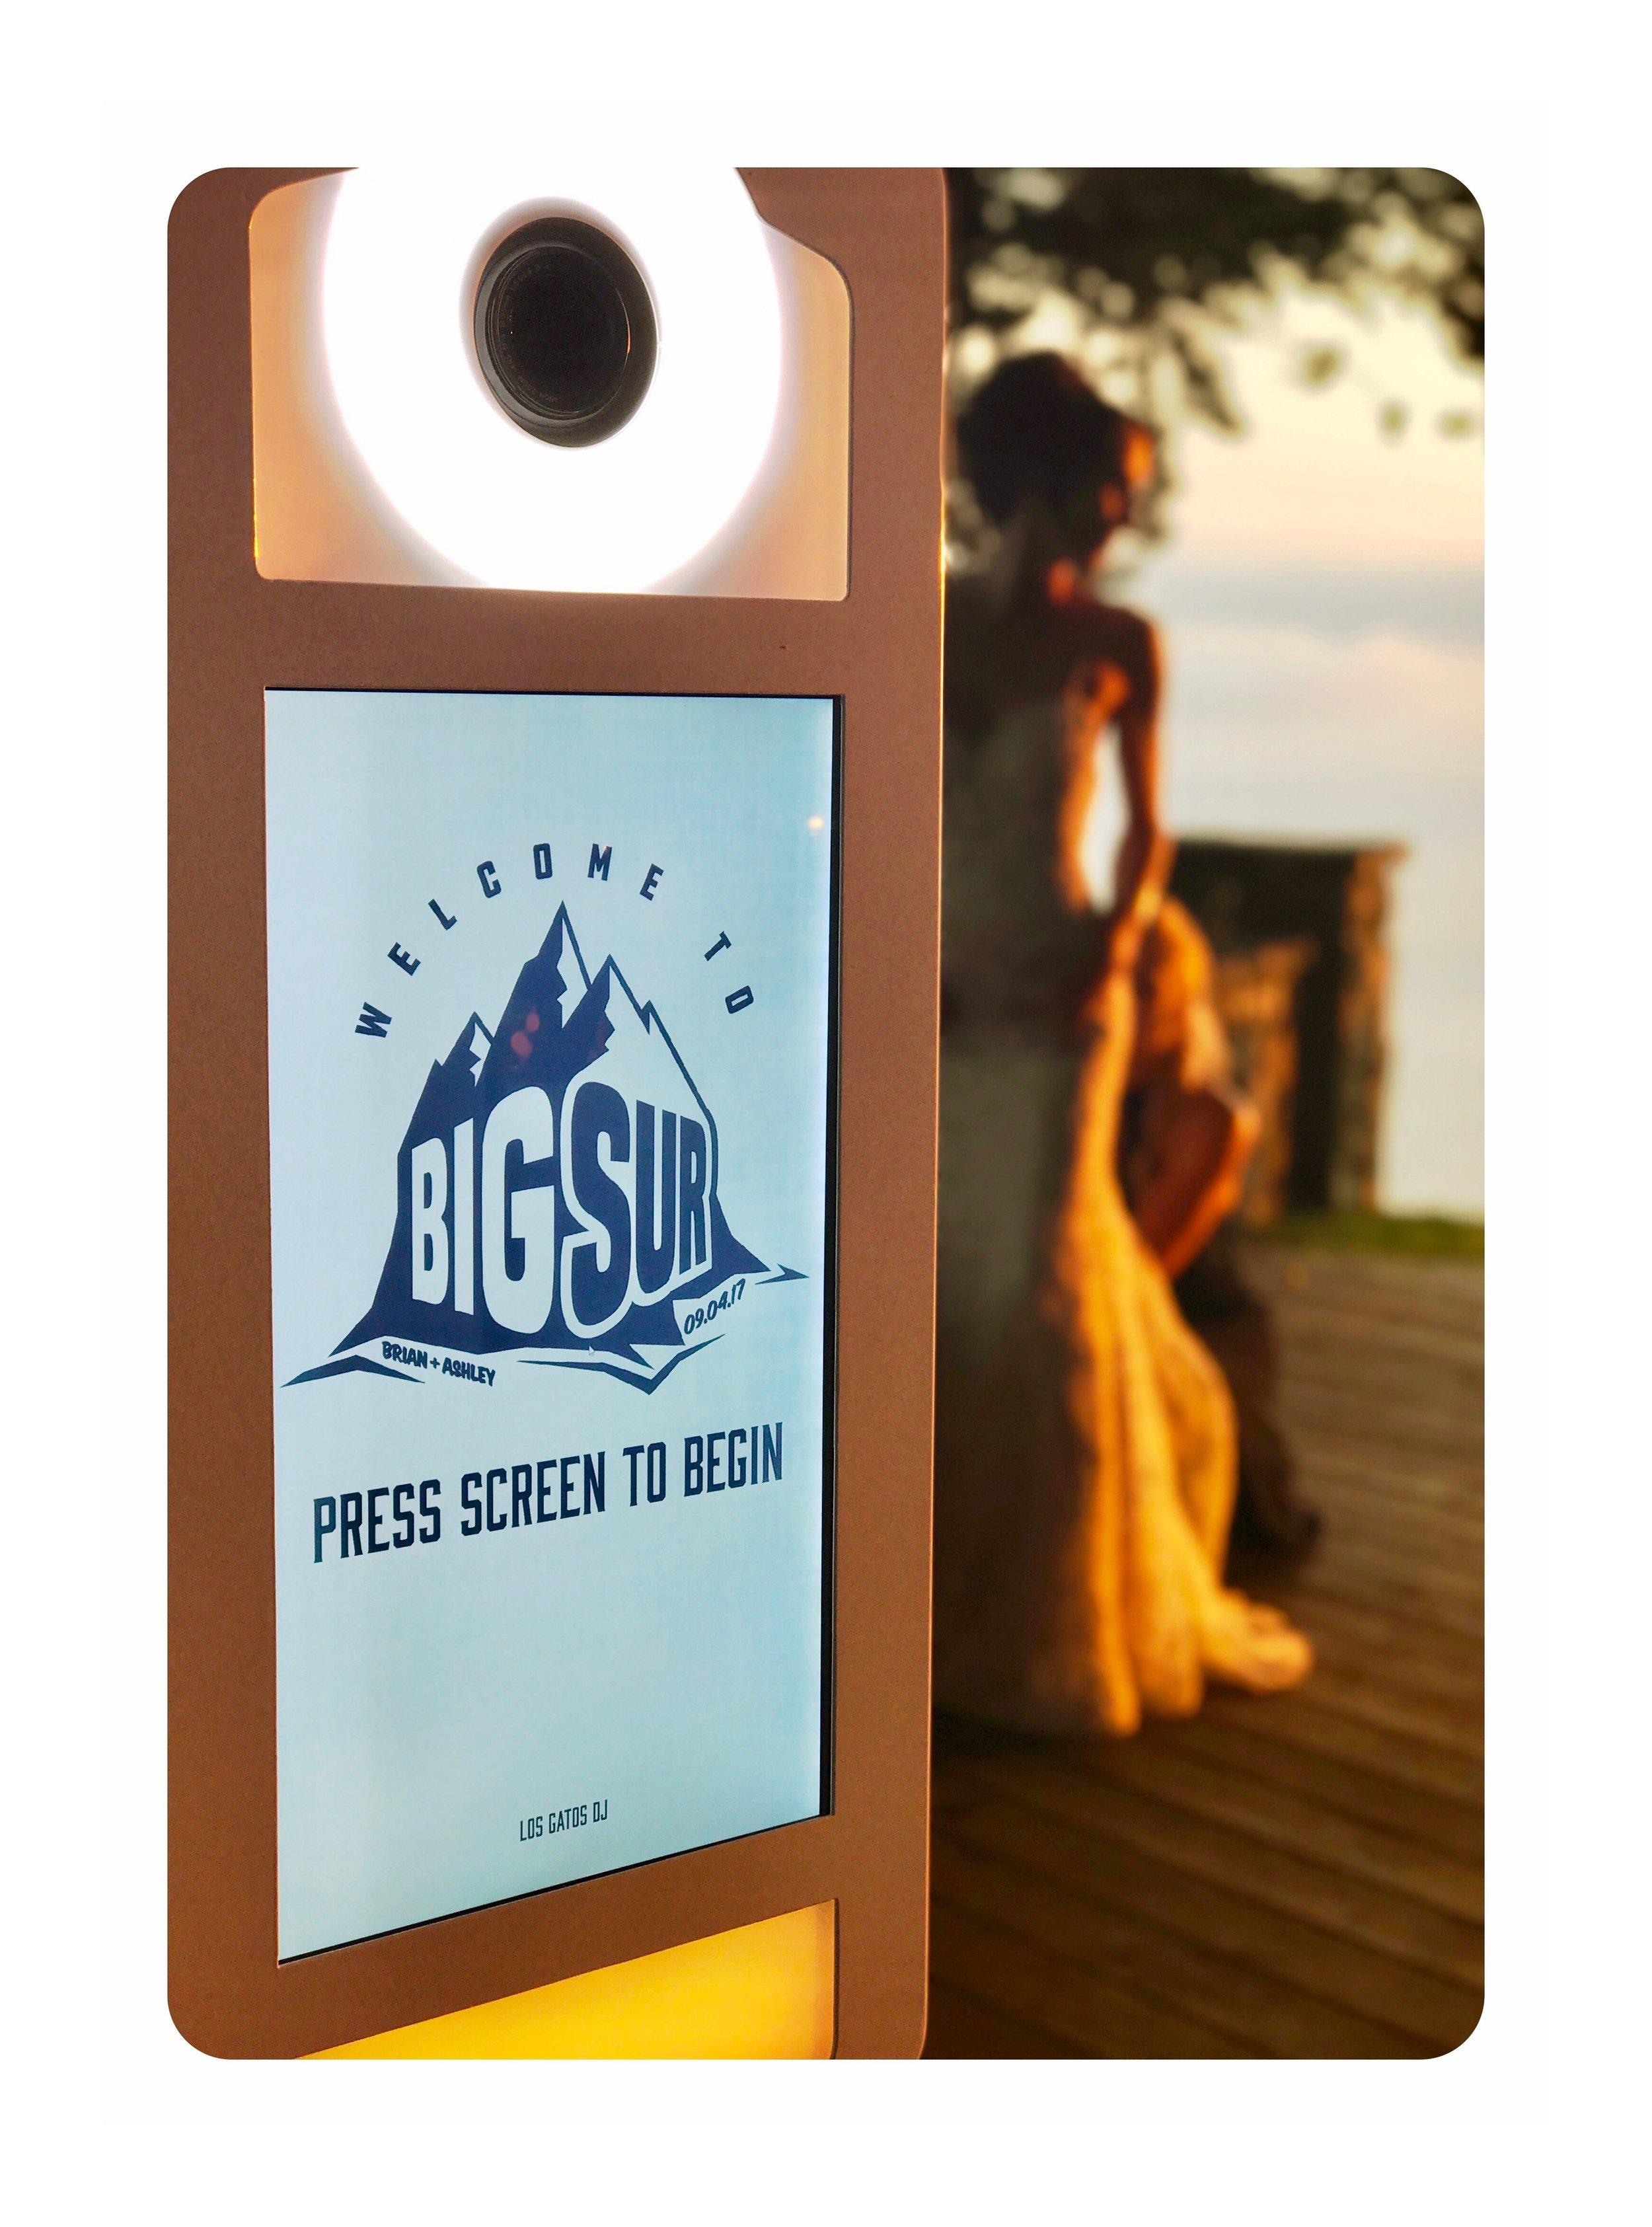 Los Gatos DJ - Photo Booth Touchscreen at Point 16 Big Sur Wedding 2017.JPG